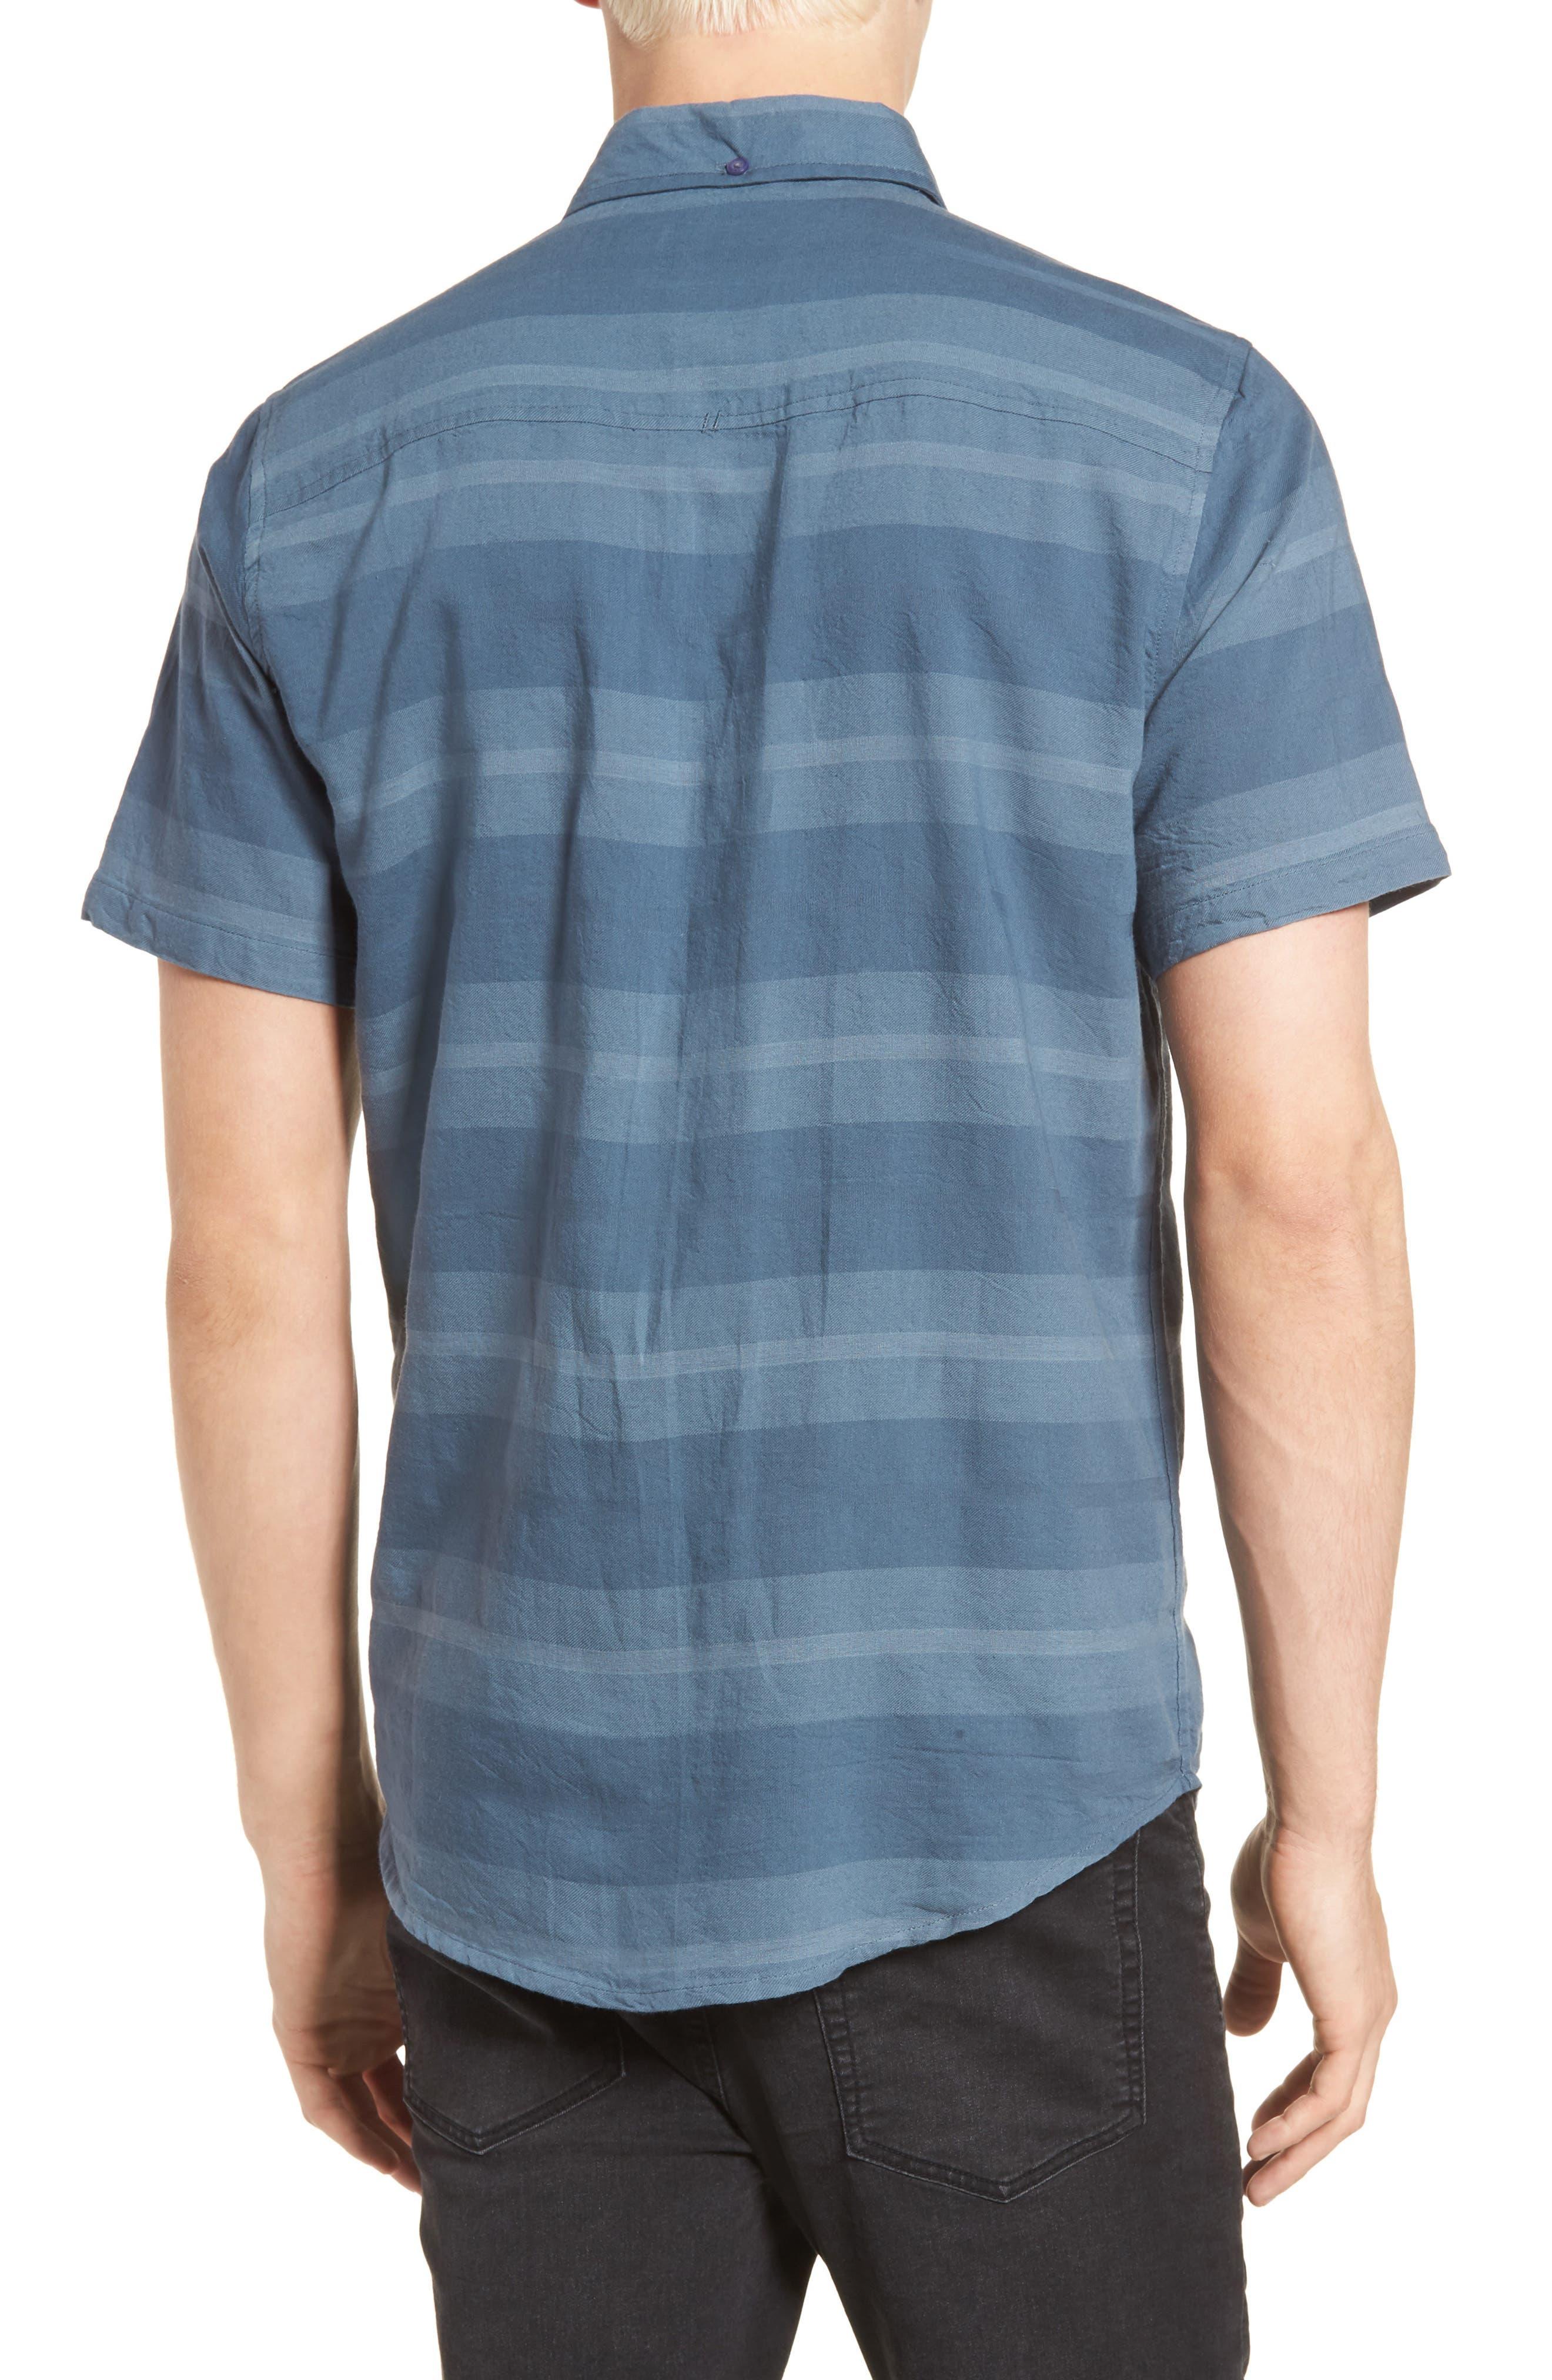 Dobson Woven Shirt,                             Alternate thumbnail 3, color,                             Storm Blue/Prison Blue Stripe